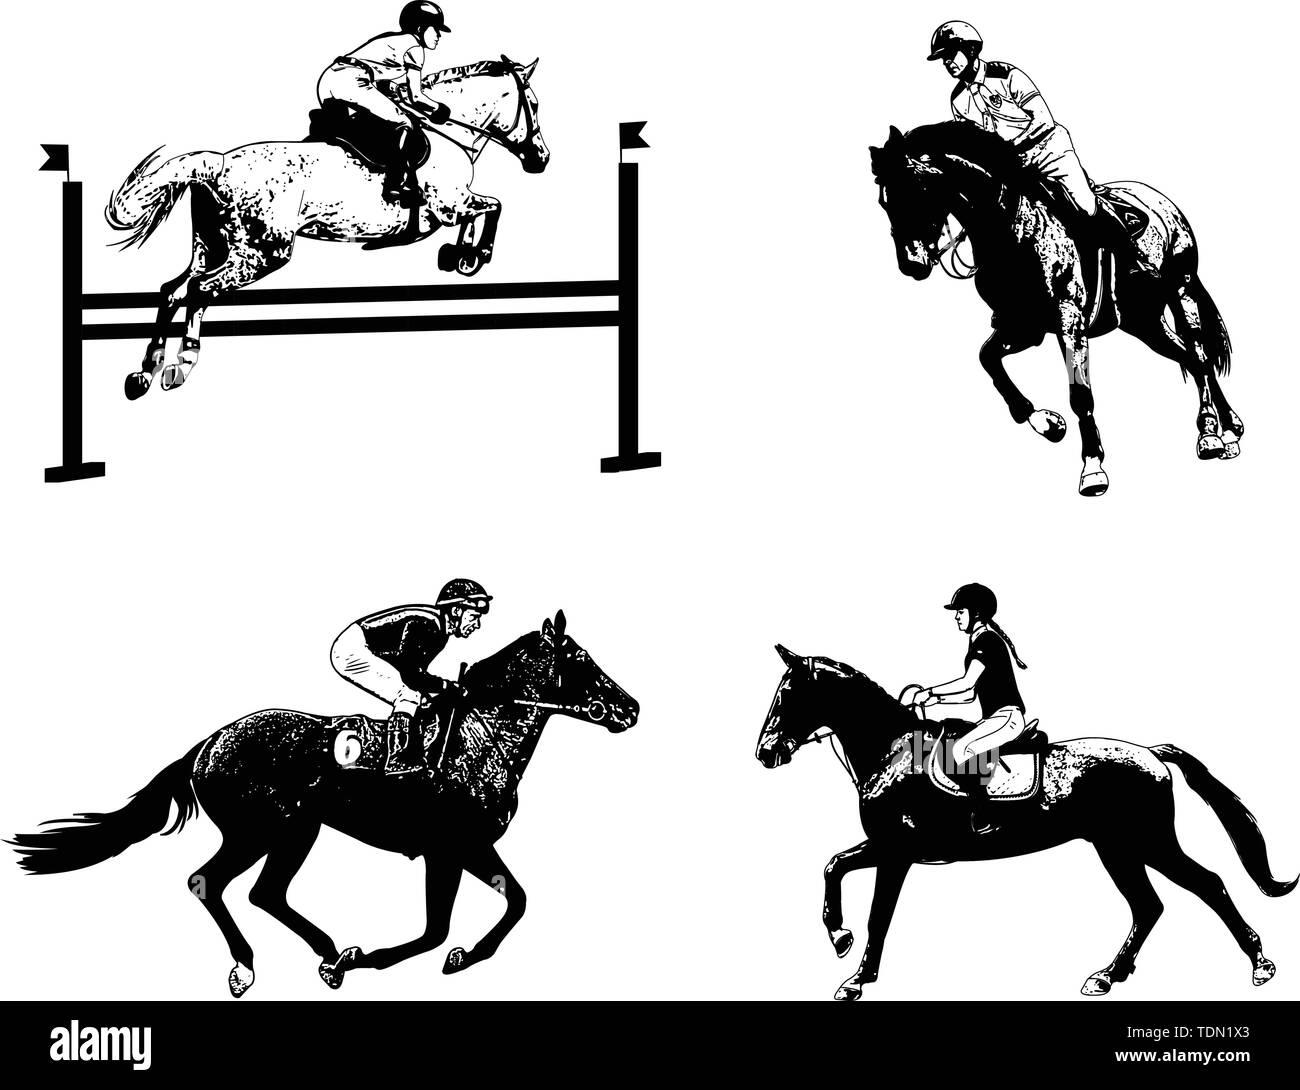 equestrian sports set, sketch illustration - vector - Stock Image